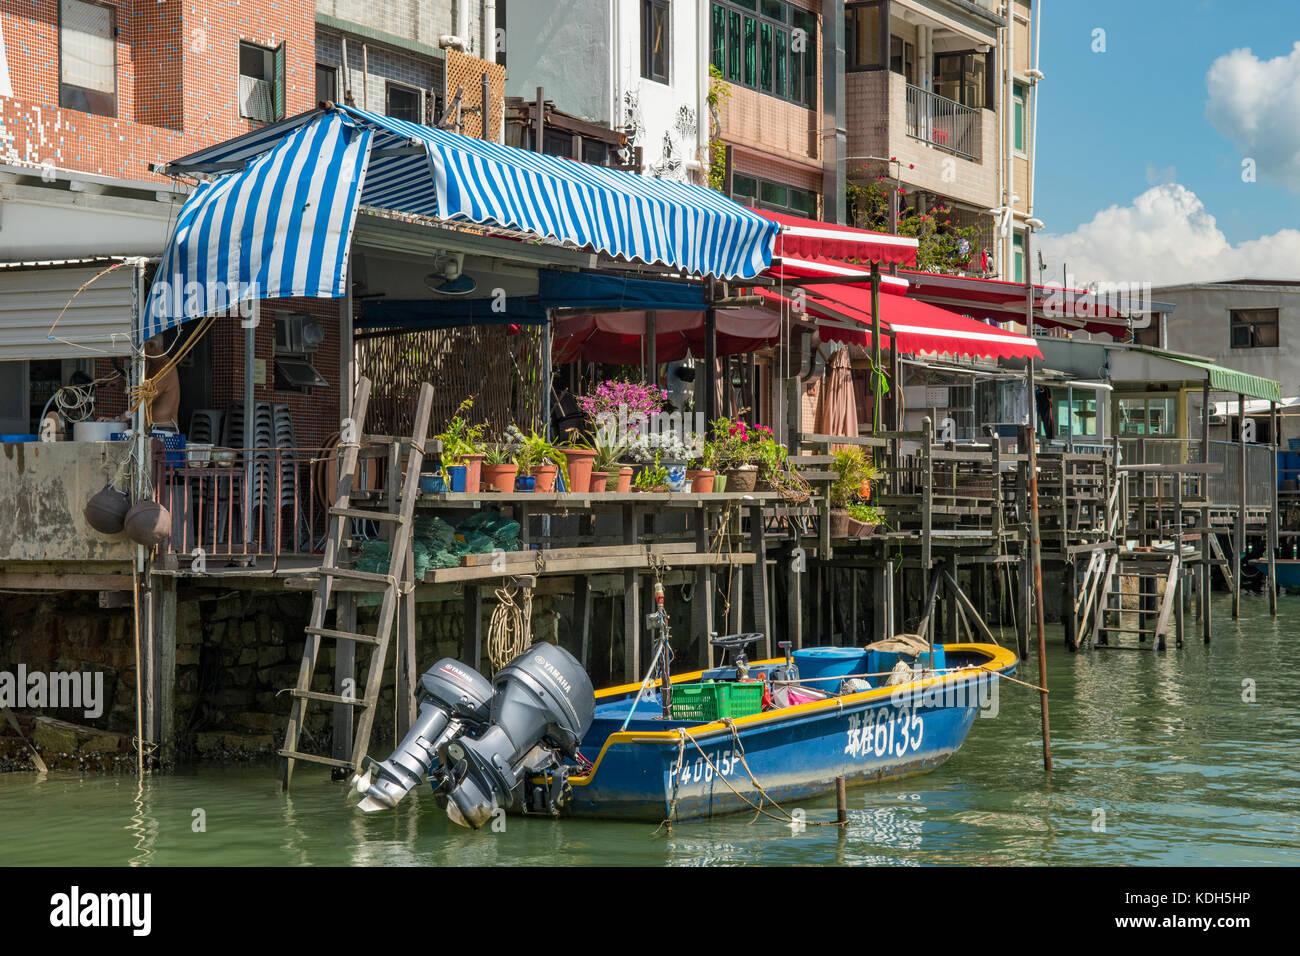 Floating Houses in Tai O Fishing Village, Lantau Island, Hong Kong, China - Stock Image